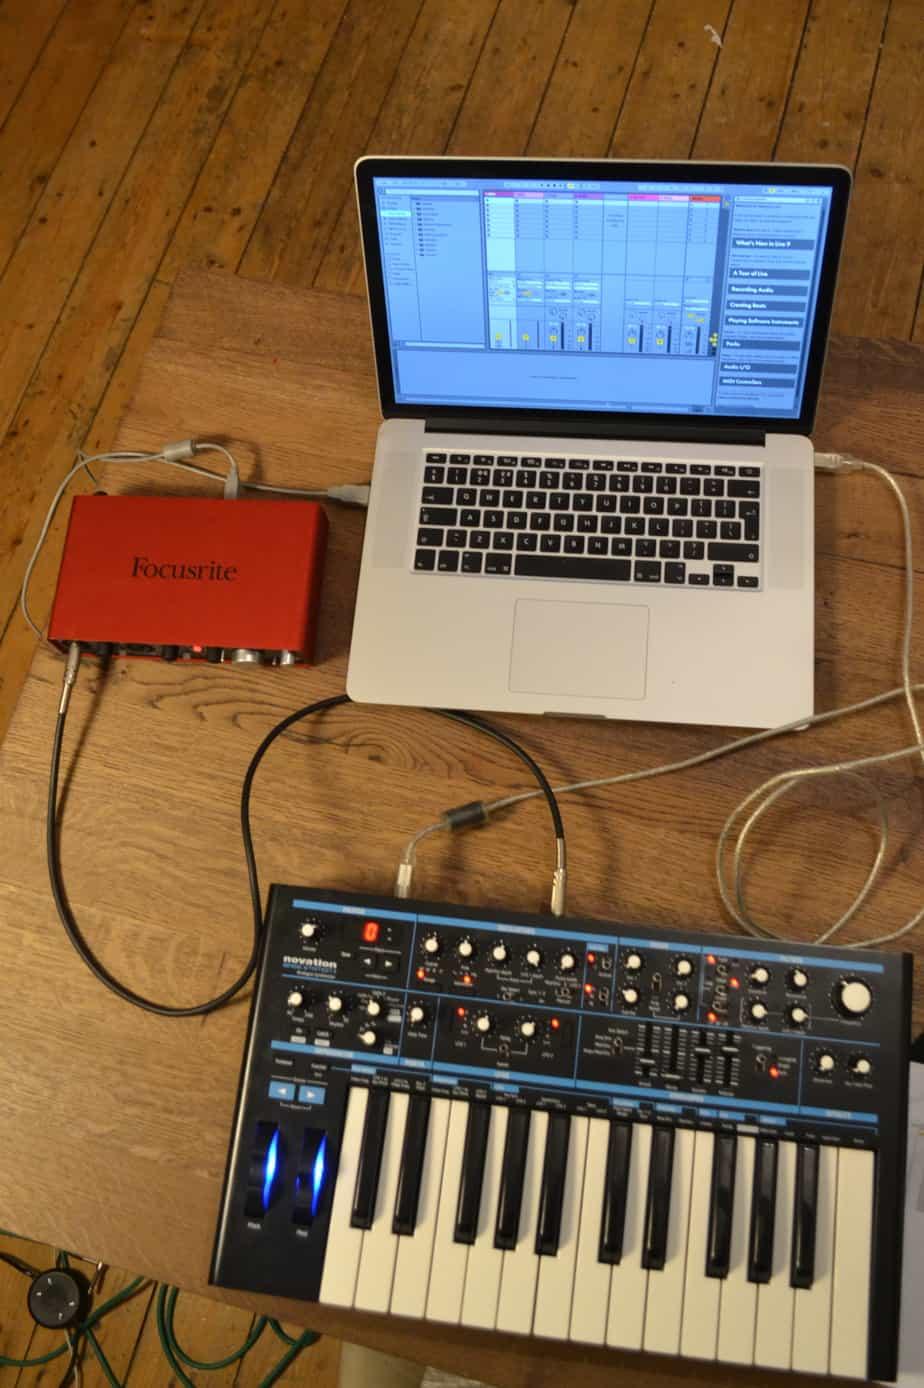 Best Macbook For Music Production 2019 Best Laptops For Music Production 2019   Musician's HQ